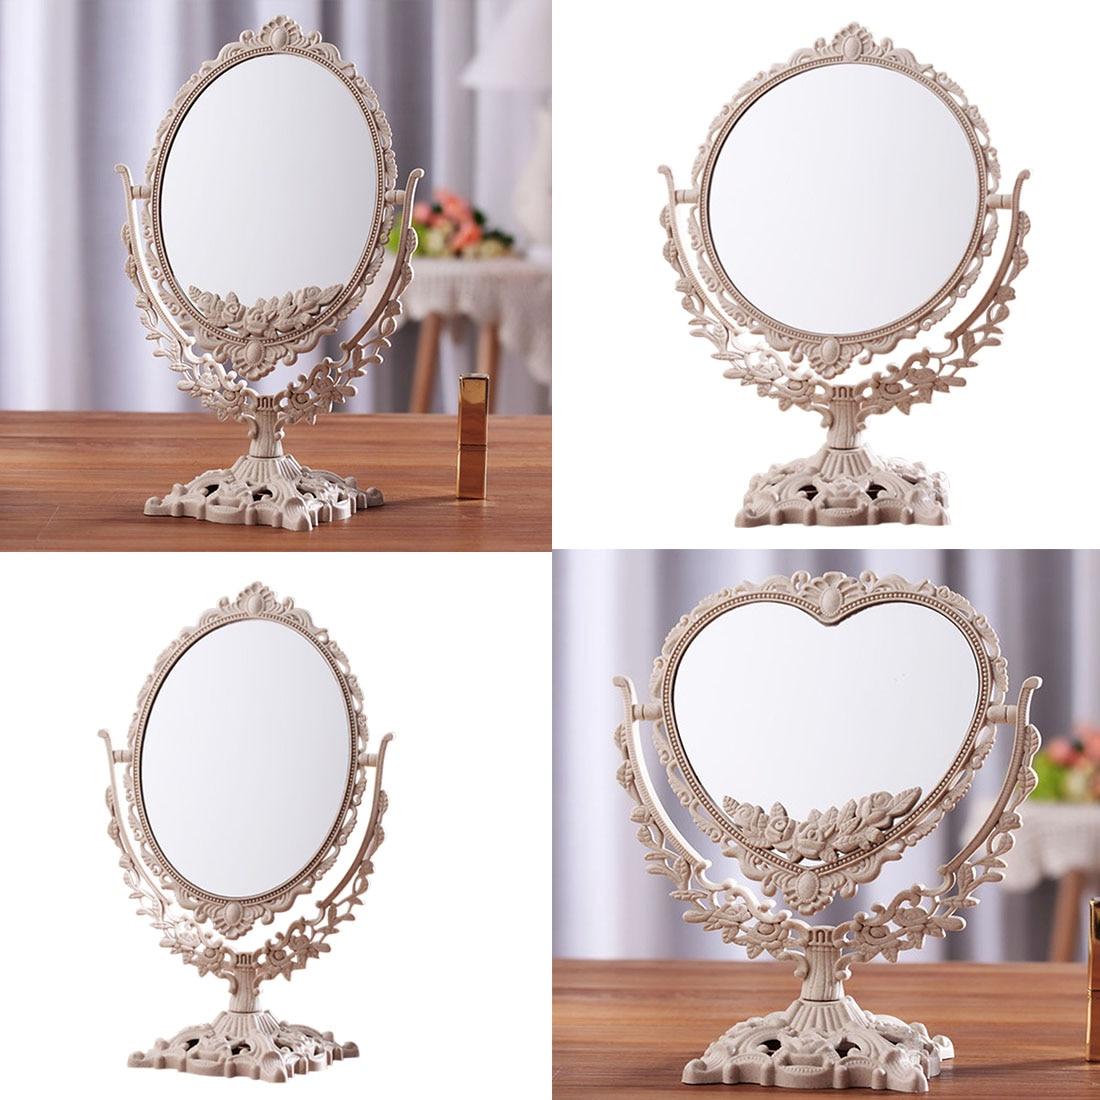 1 Pcs Vintage Lady Carved Makeup Mirror Desktop Rotatable Vanity Mirror SPA Salon Cosmetic Mirror Co